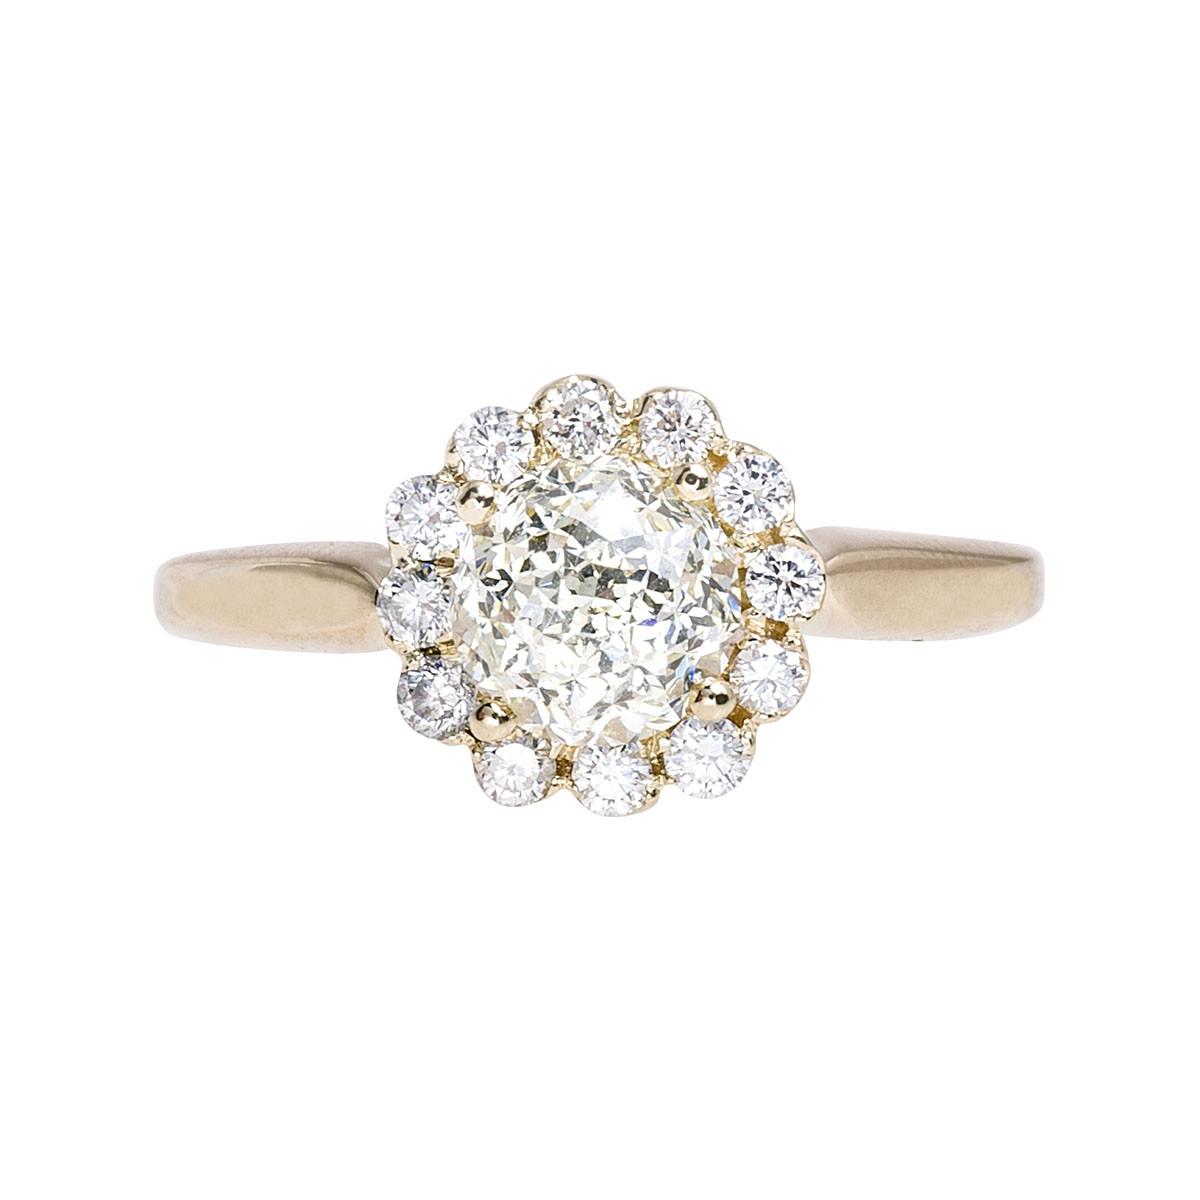 Vintage 1.41 CTW Diamond Halo Ring